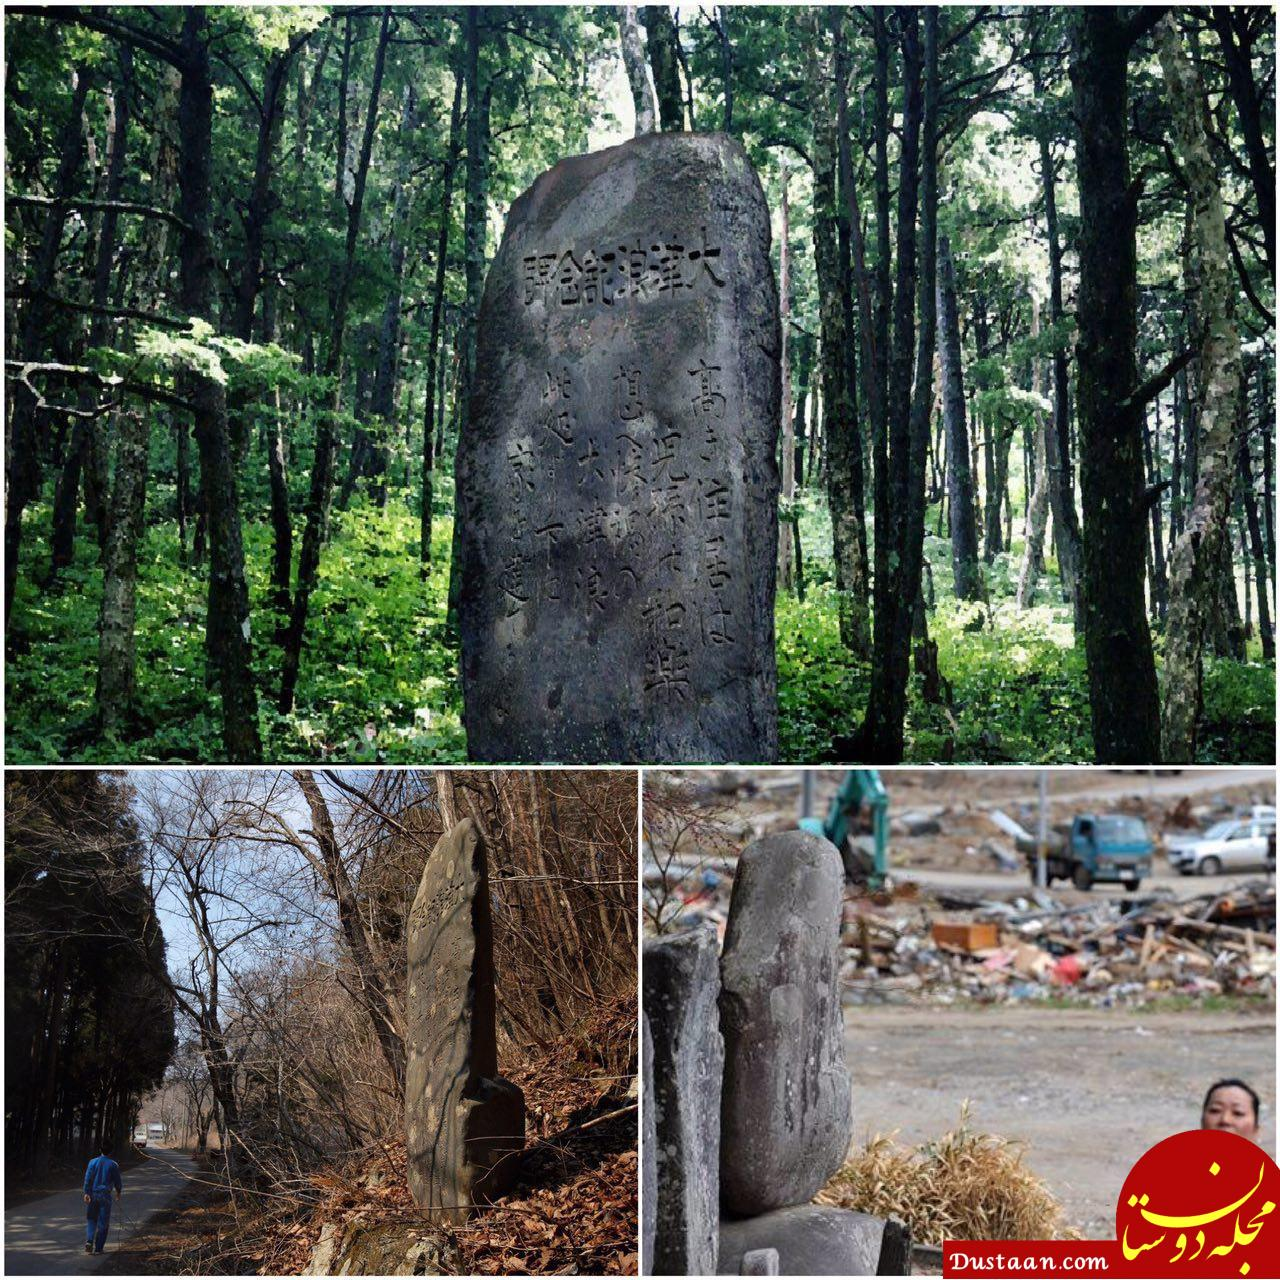 www.dustaan.com سنگ های هشدار دهنده 800 ساله در ژاپن! +عکس